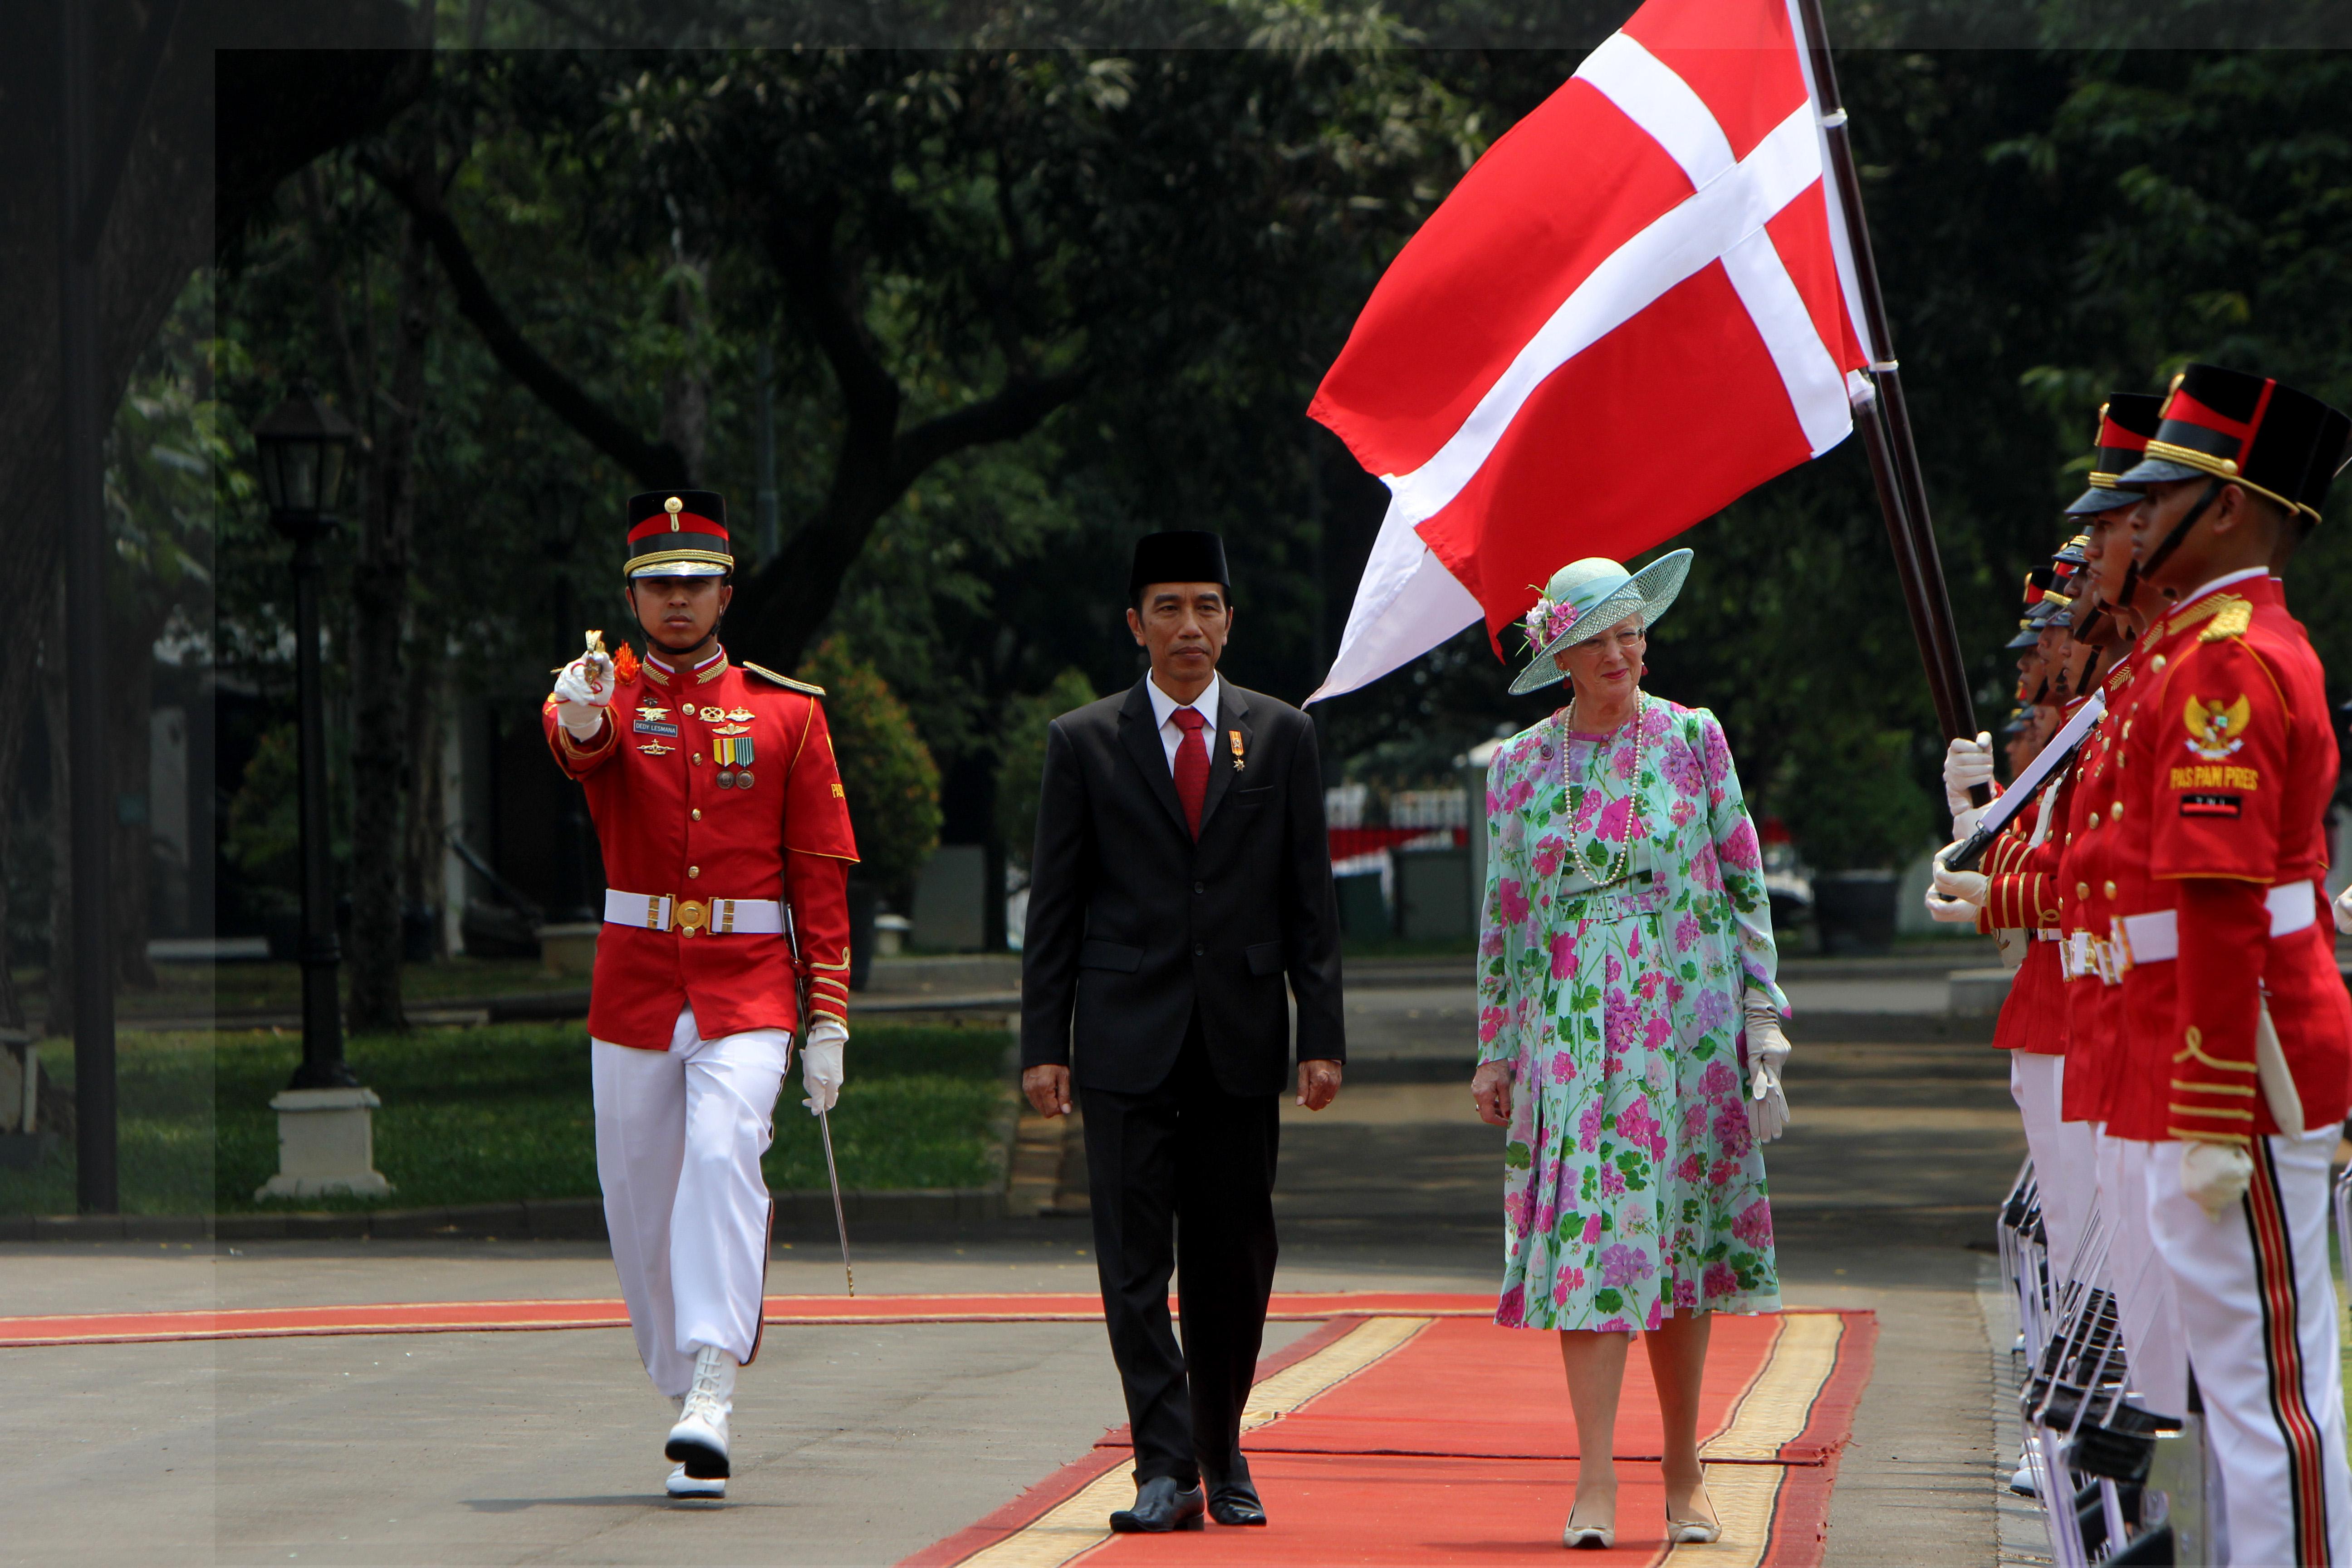 Presiden Jokowi bersama Ratu Denmark Margrethe II sedang memeriksa pasukan barisan upacara kenegaraan. FOTO : VIBIZMEDIA.COM/RULLY